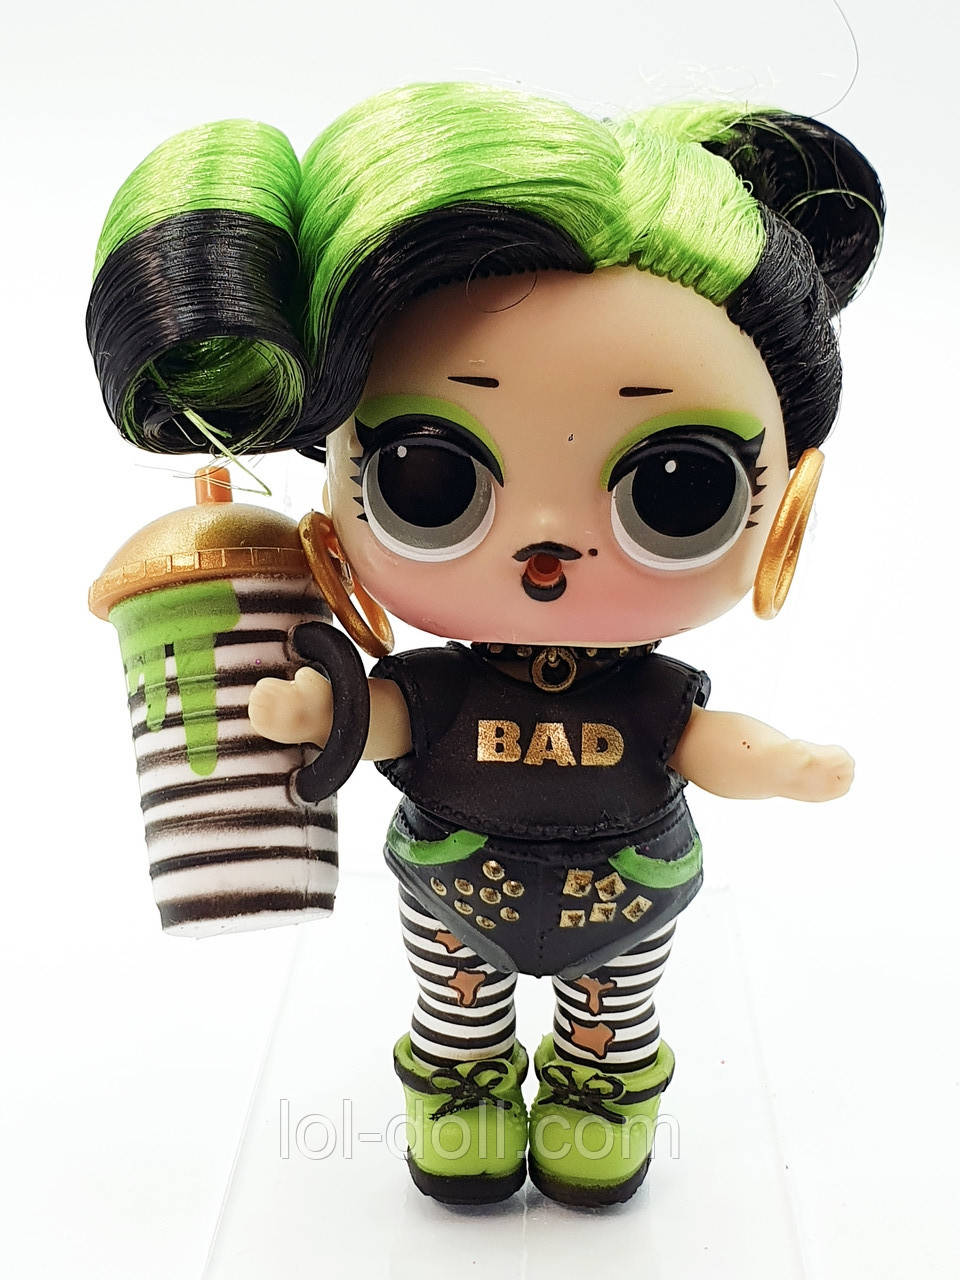 Кукла LOL Surprise 5 Серия Bhaddie - Бади, Зеленка Hairgoals Лол Сюрприз Без Шара Оригинал